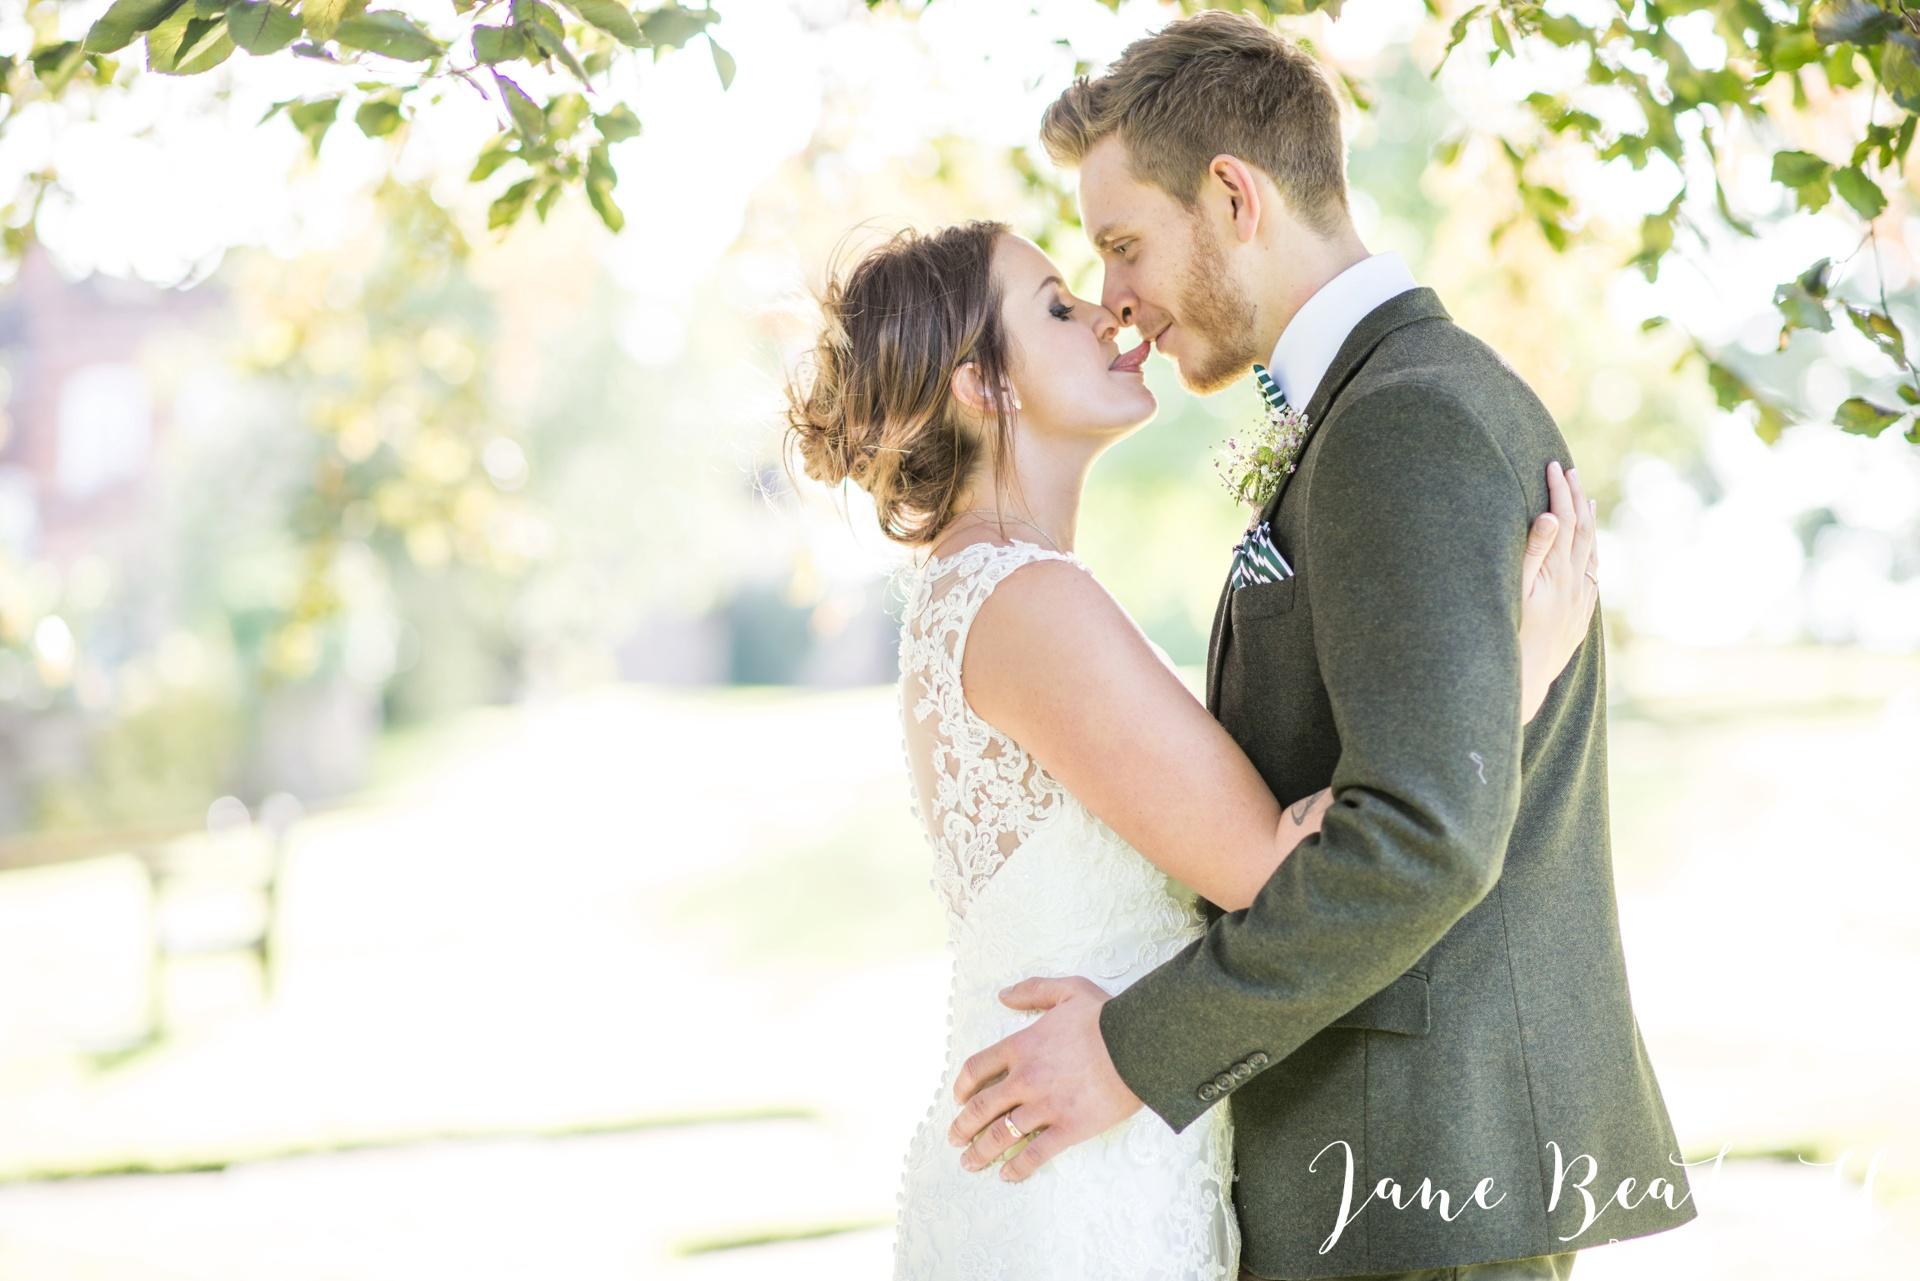 Jane Beadnell fine art wedding photographer The Old Deanery Ripon_0088